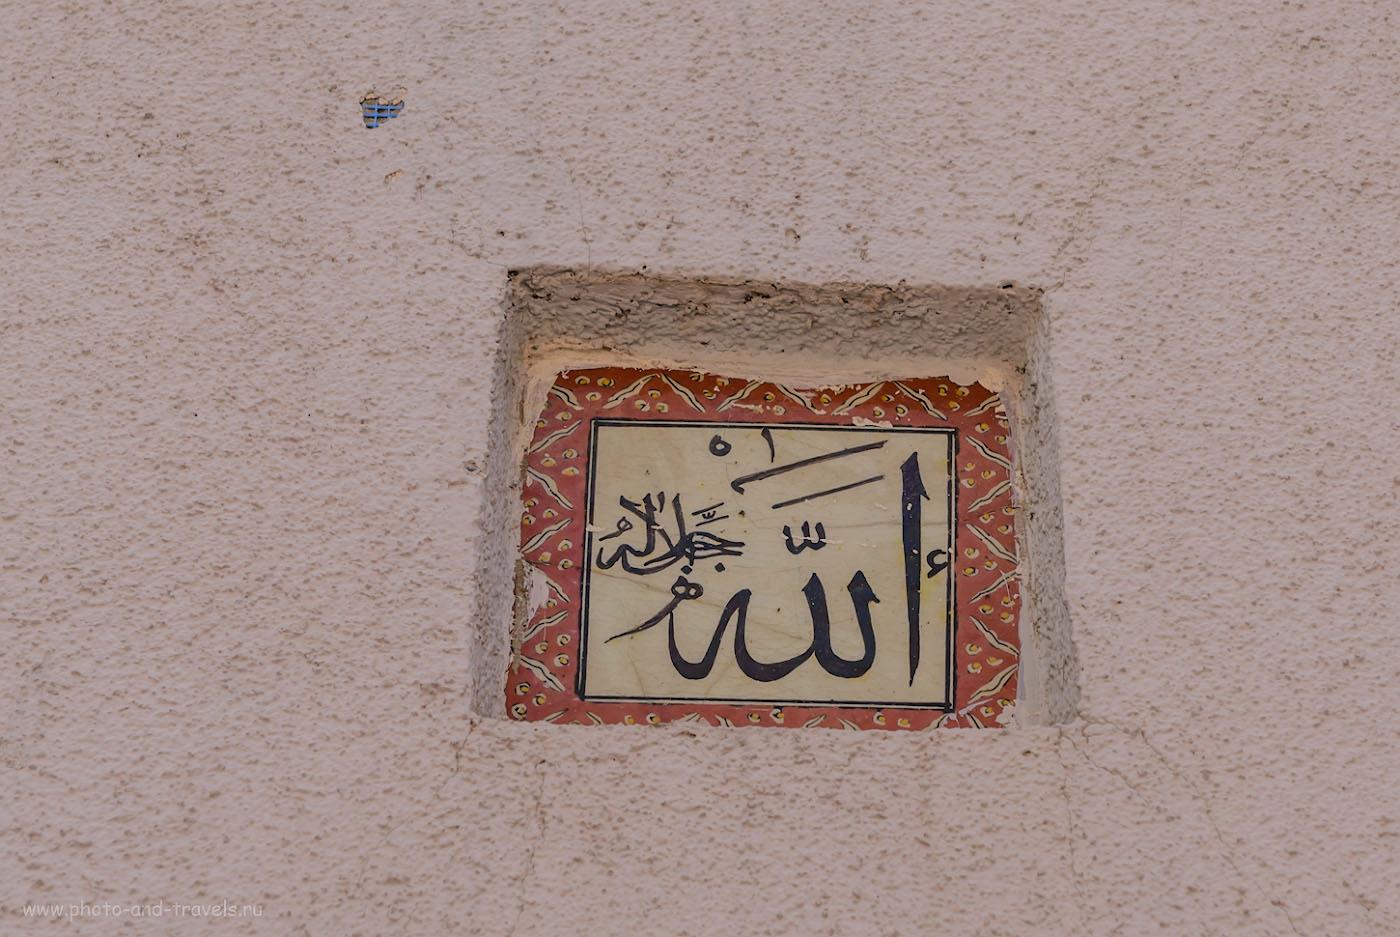 Фото 10. Прогулка по Стамбулу. Фотоотчеты туристов. 1/400, 8.0, 200, 70.